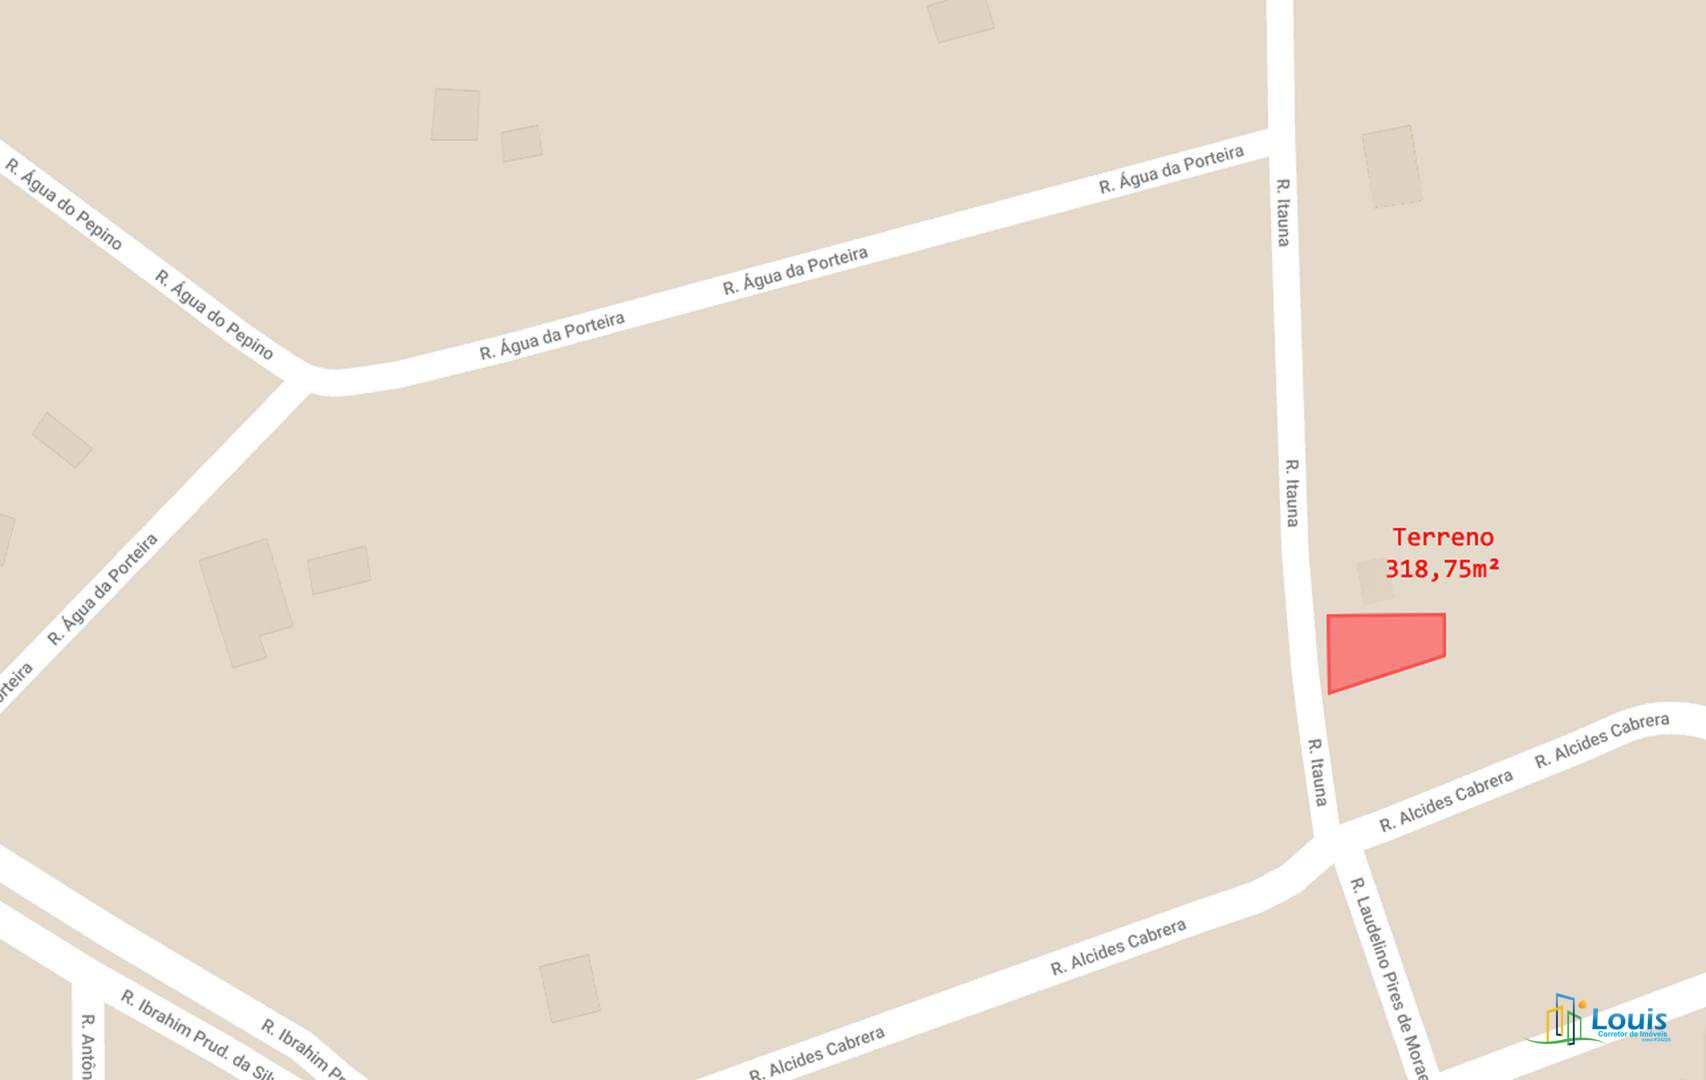 Terreno 318,75m², Recanto Alvorada (LT 08), Ibiporã/PR